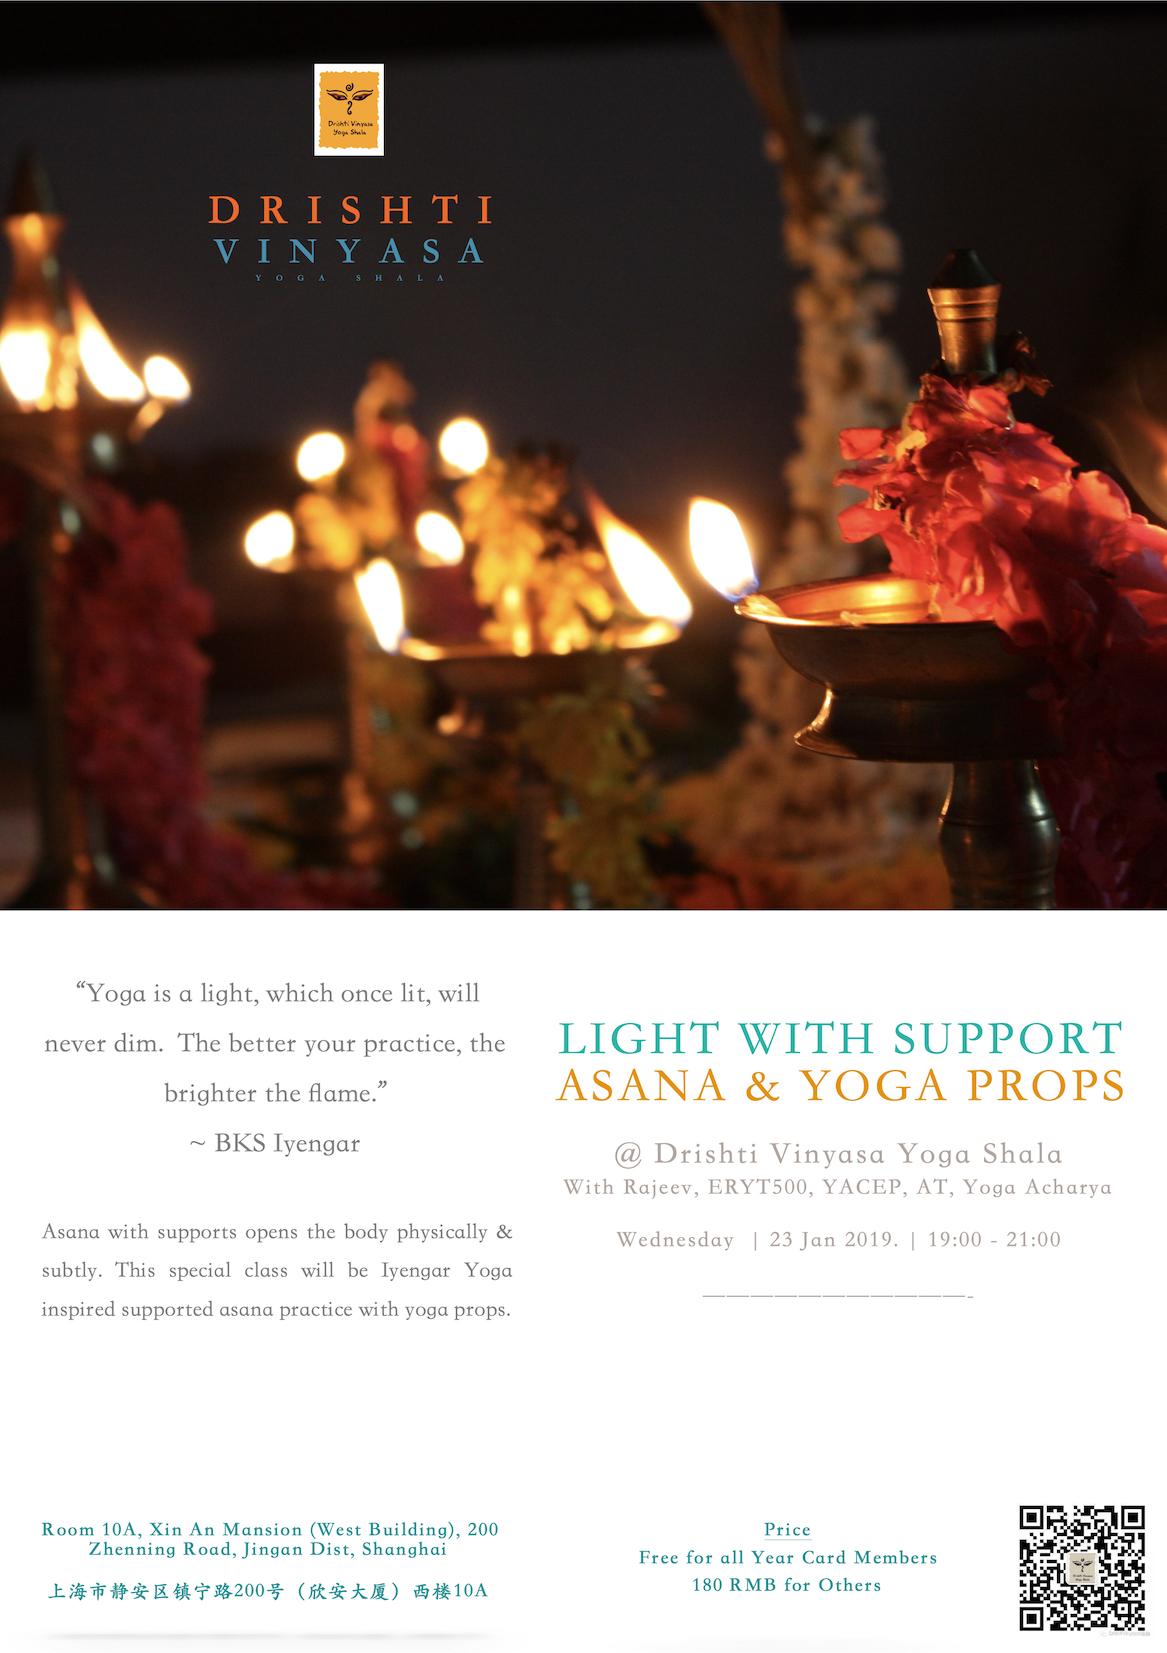 Asana Yoga Props With Rajeev